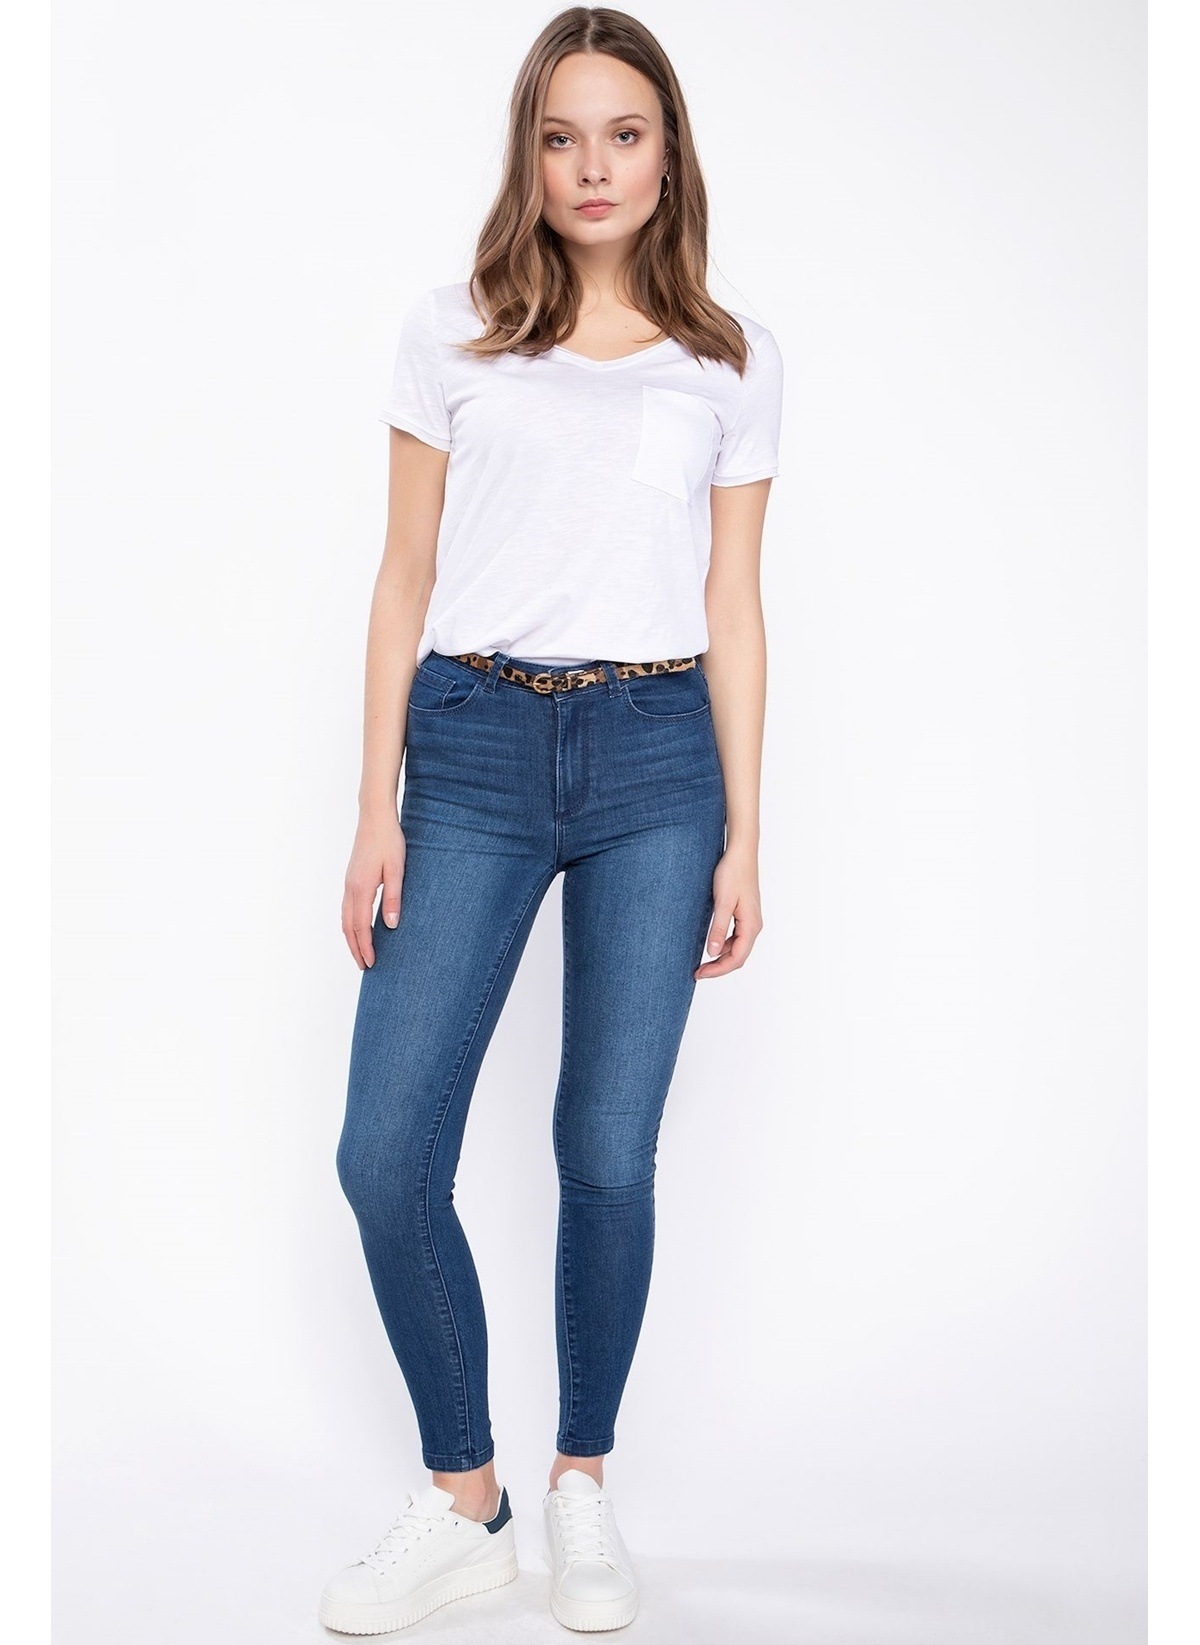 Defacto Anna Yüksek Bel Super Skinny Denim Pantolon J9122az19spnm28jean Pantolon – 59.99 TL